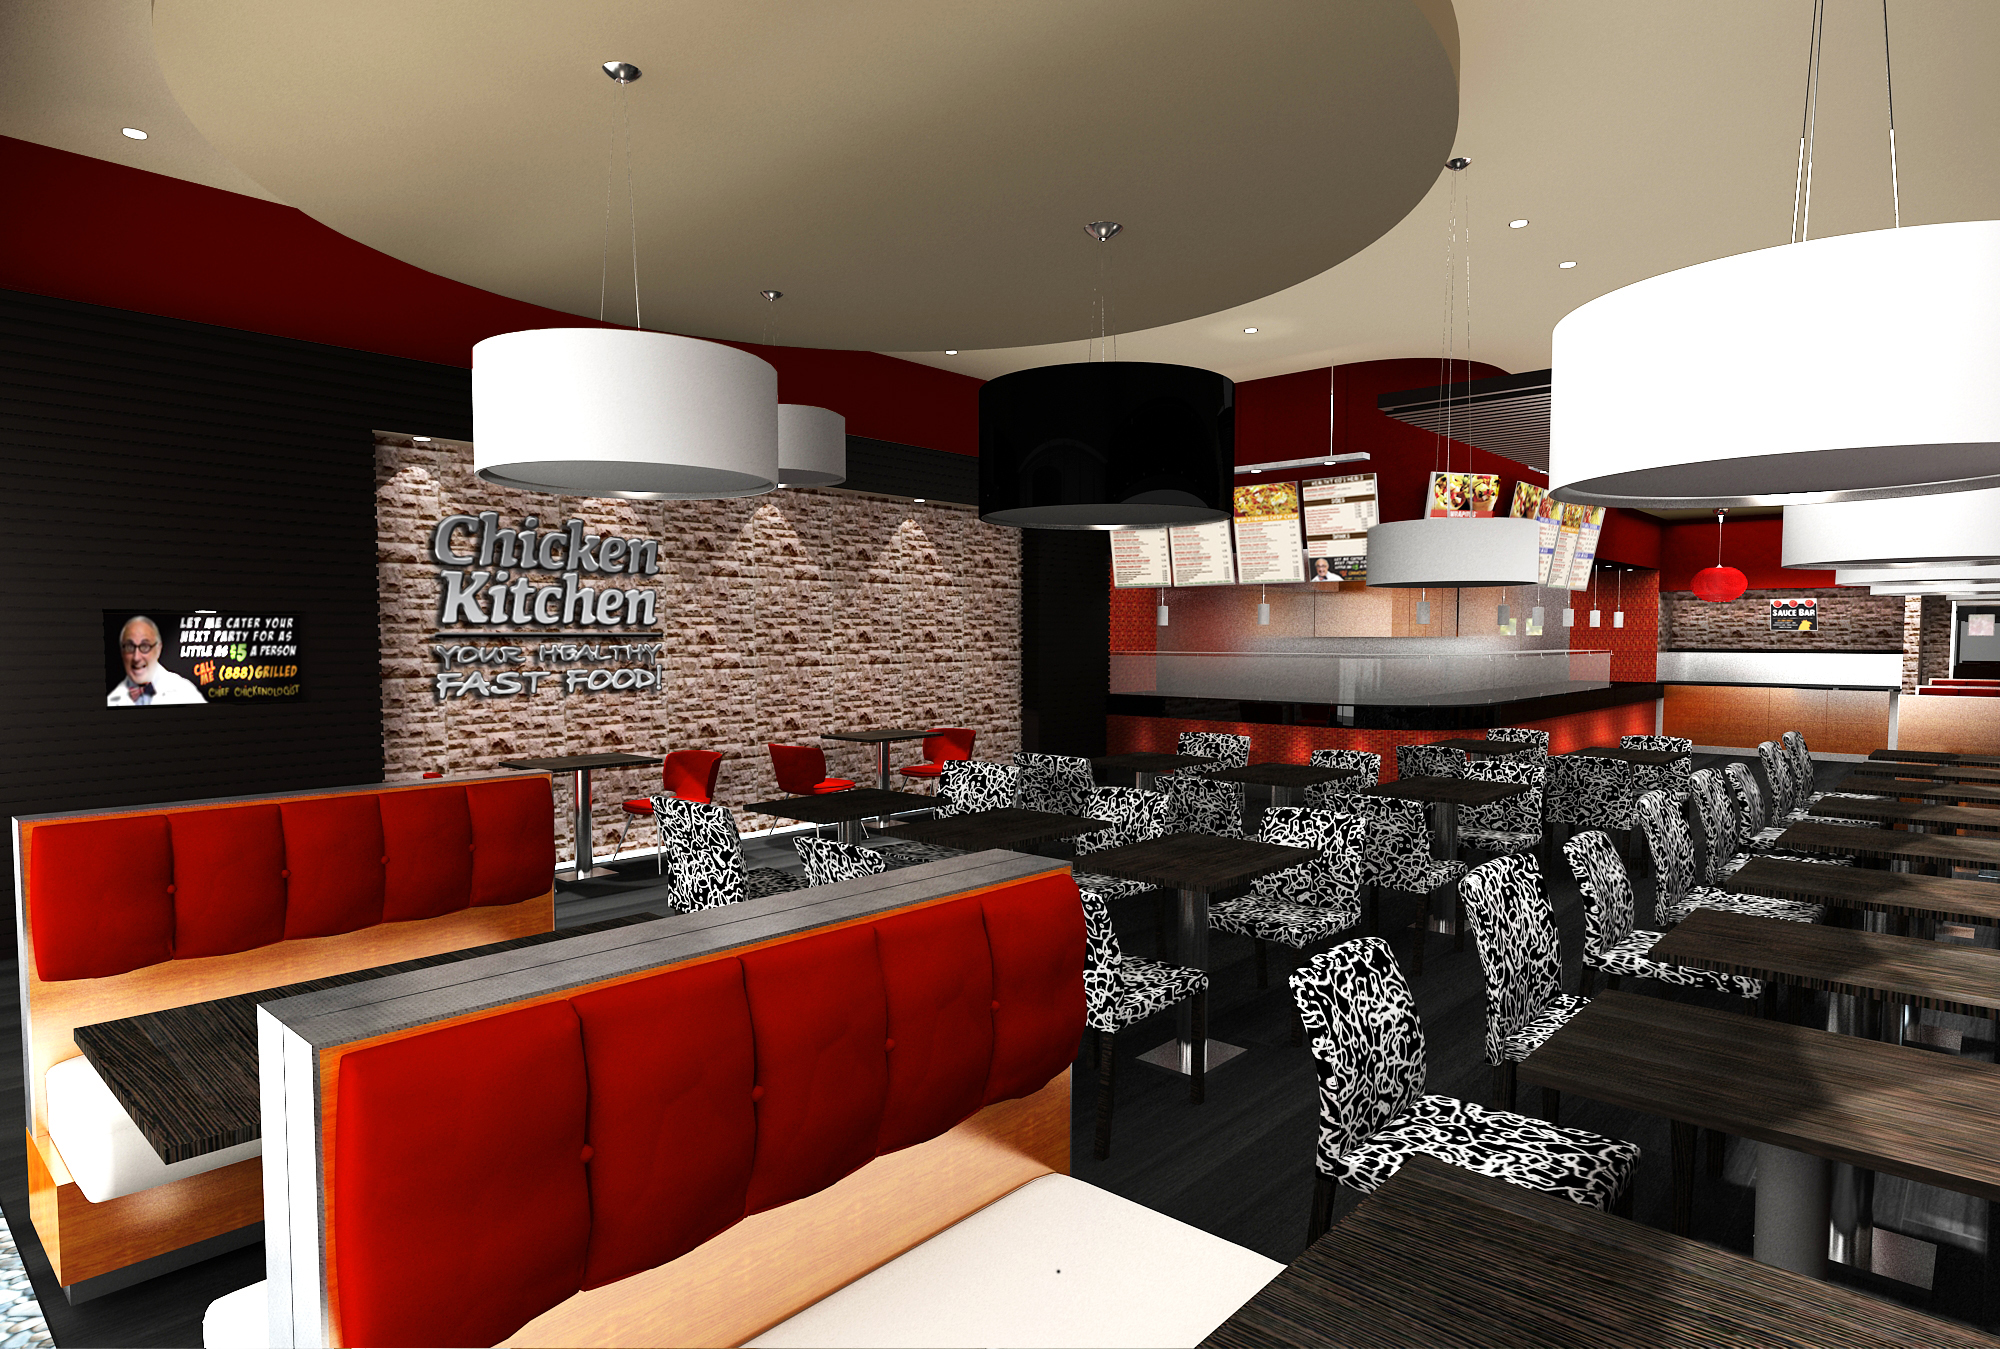 kitchen miami pot chicken yates associates architecture inc interior